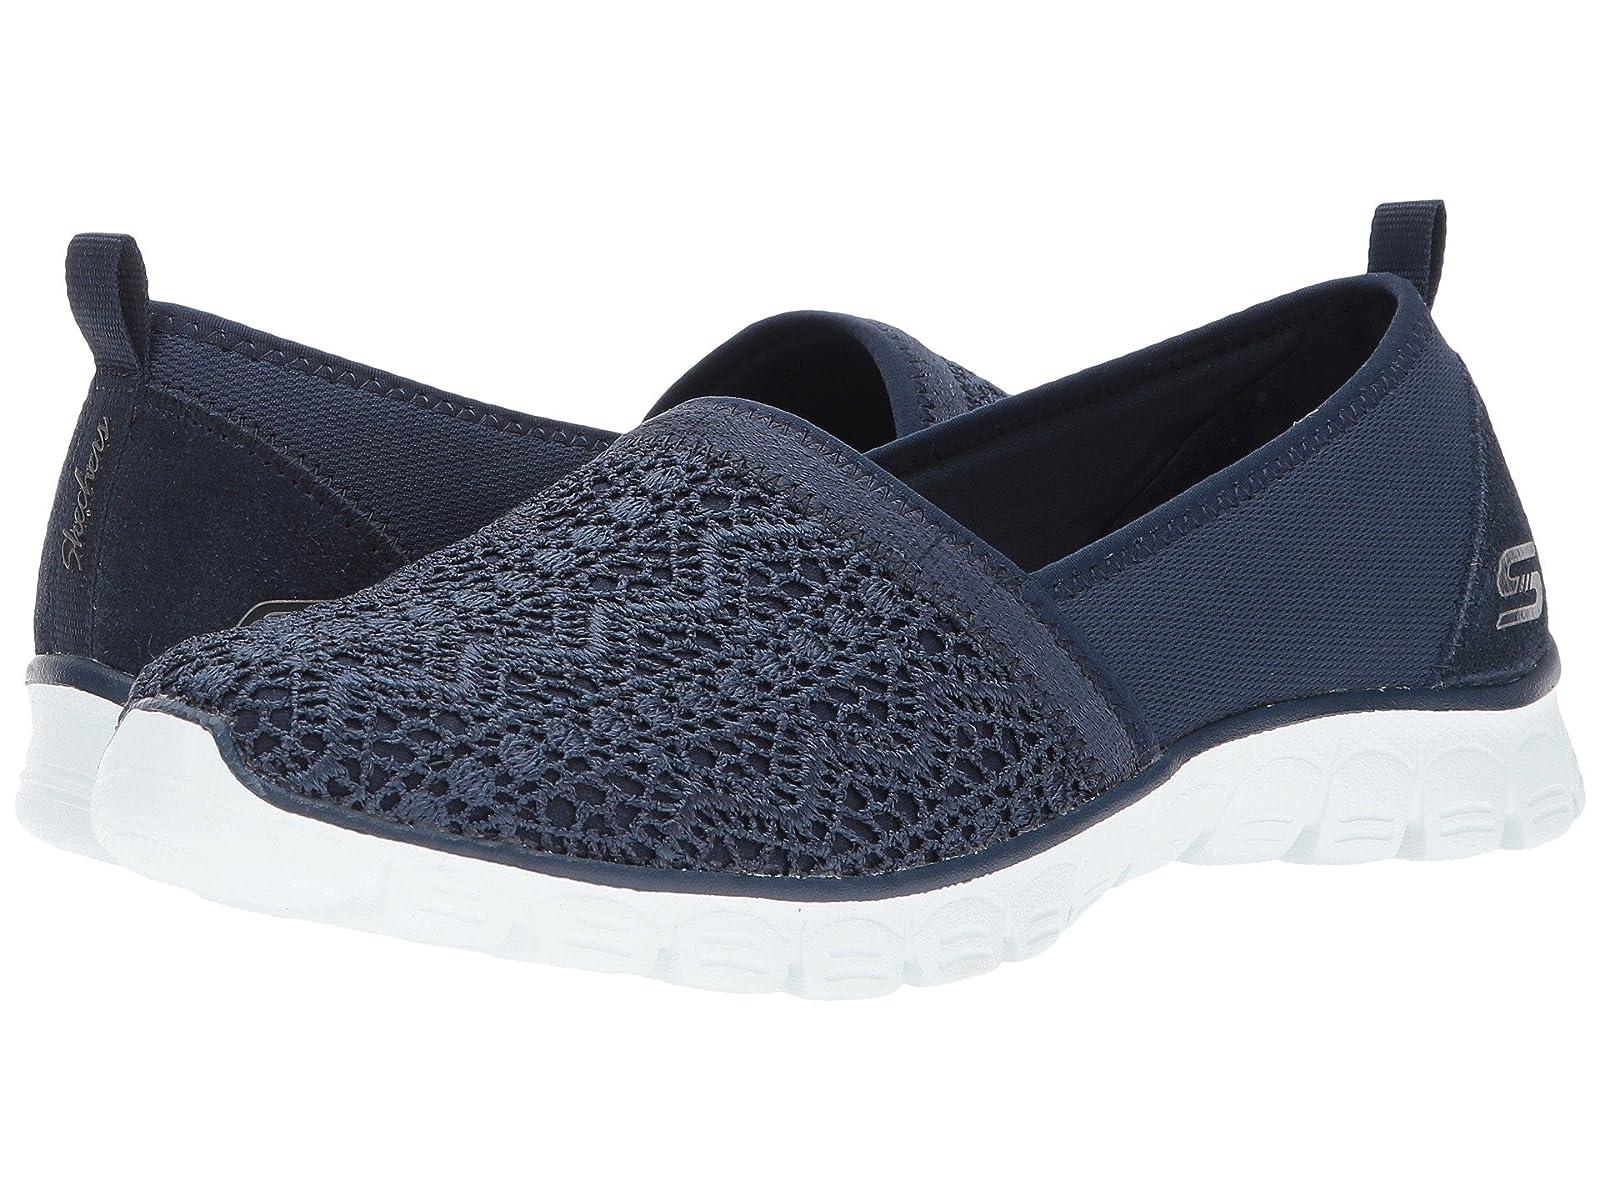 SKECHERS EZ Flex 3.0 - DuchessCheap and distinctive eye-catching shoes